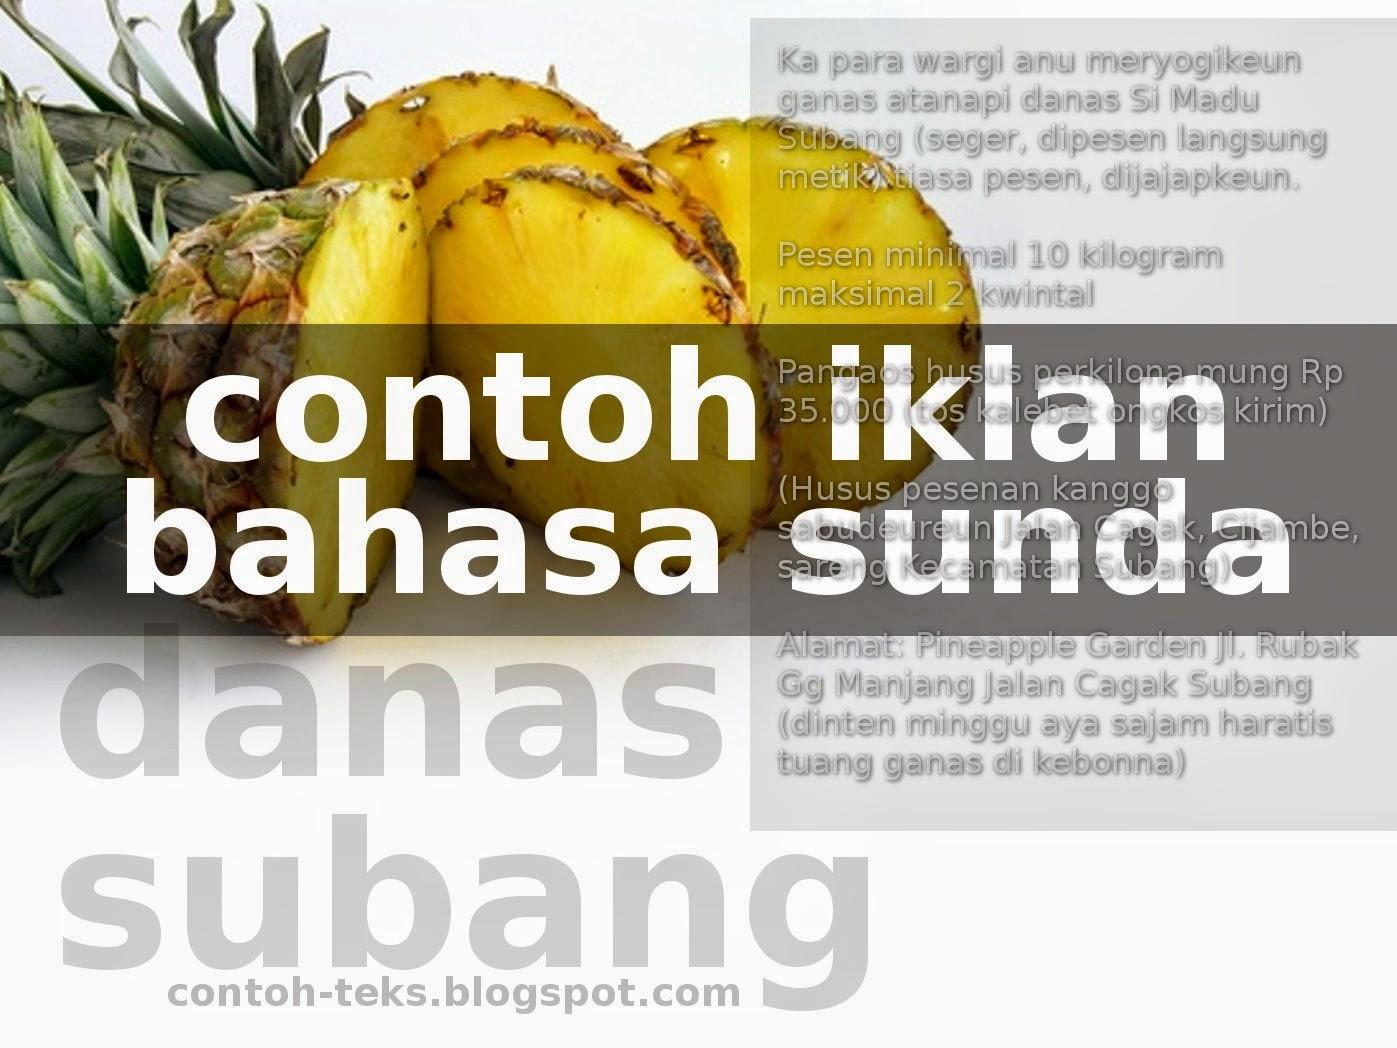 Cerita Bahasa Sunda Sumedang Sunda Wikipedia Bahasa Indonesia Ensiklopedia Bebas Nampi Pesenan Teks Iklan Basa Sunda Panduanmu